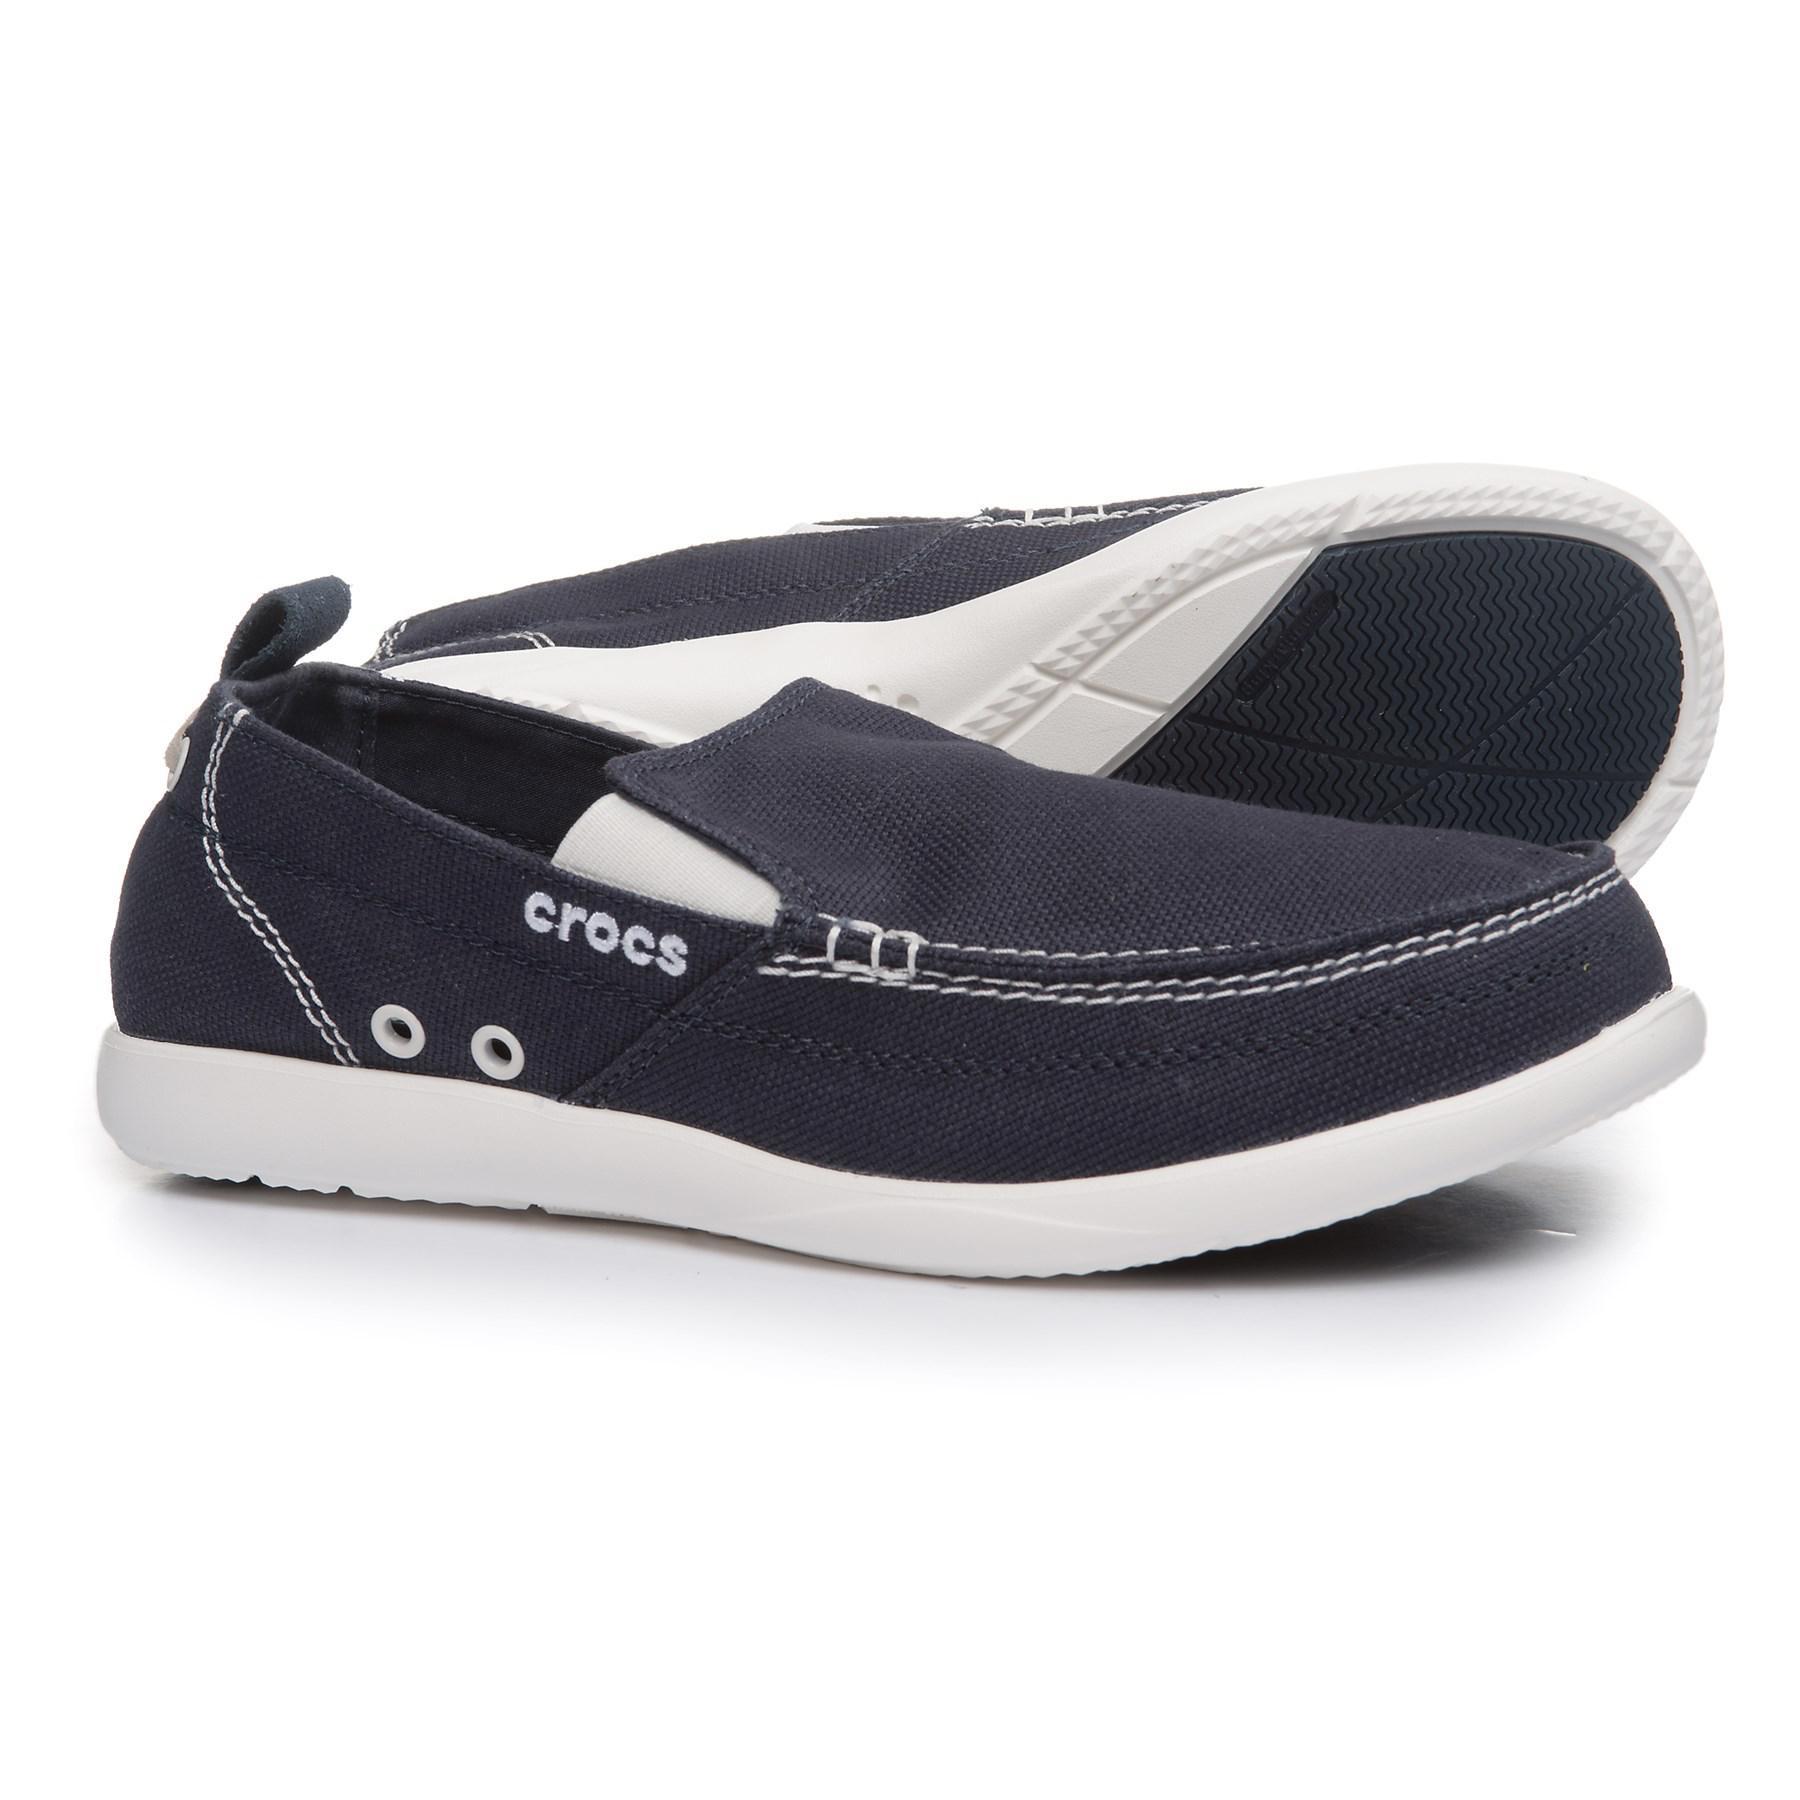 5c9e2bbe0 Lyst - Crocs™ Walu Loafers (for Men) in Blue for Men